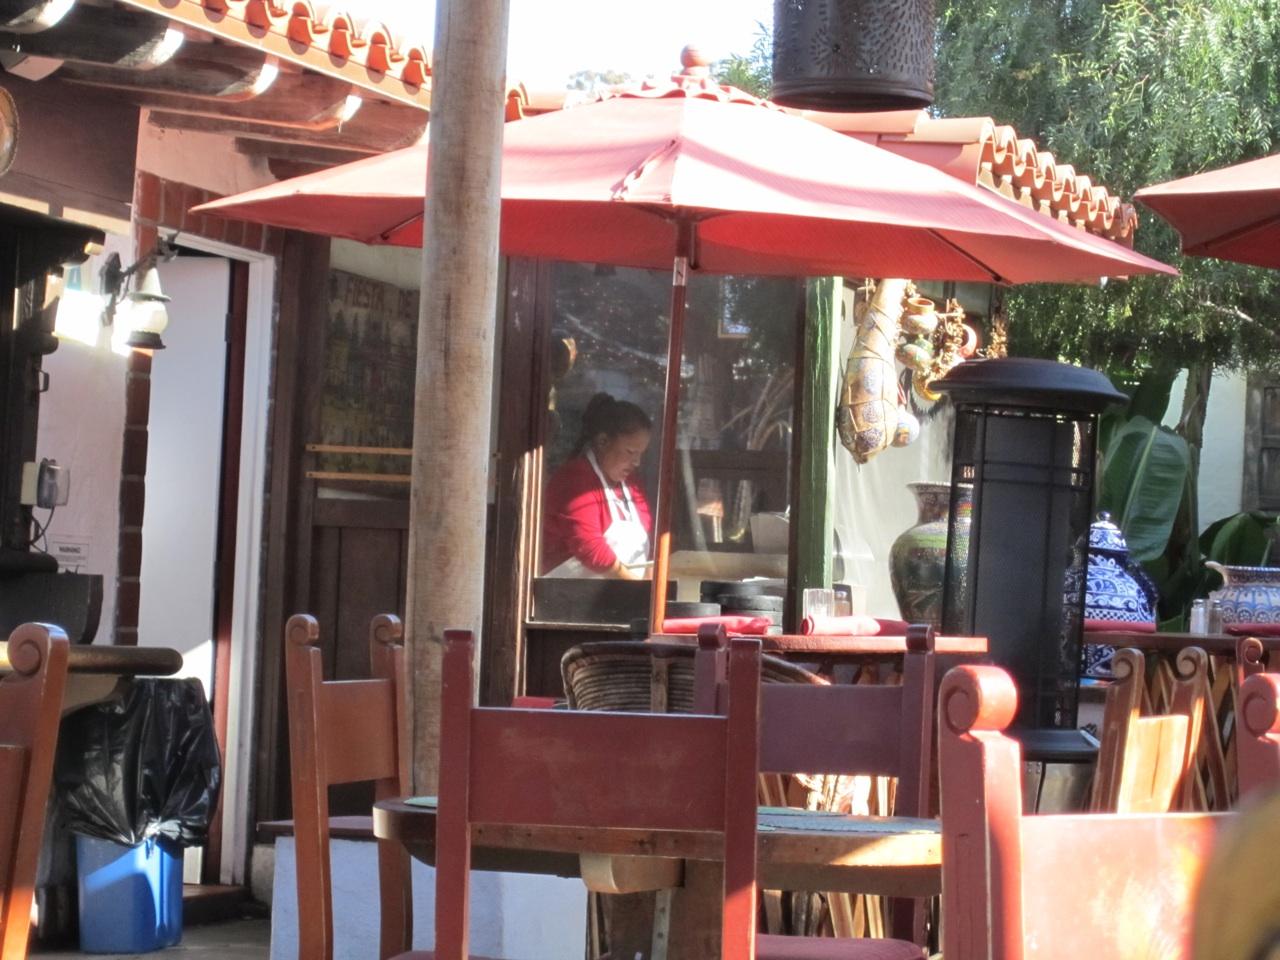 Woman Making Fresh Tortillas, YUM!